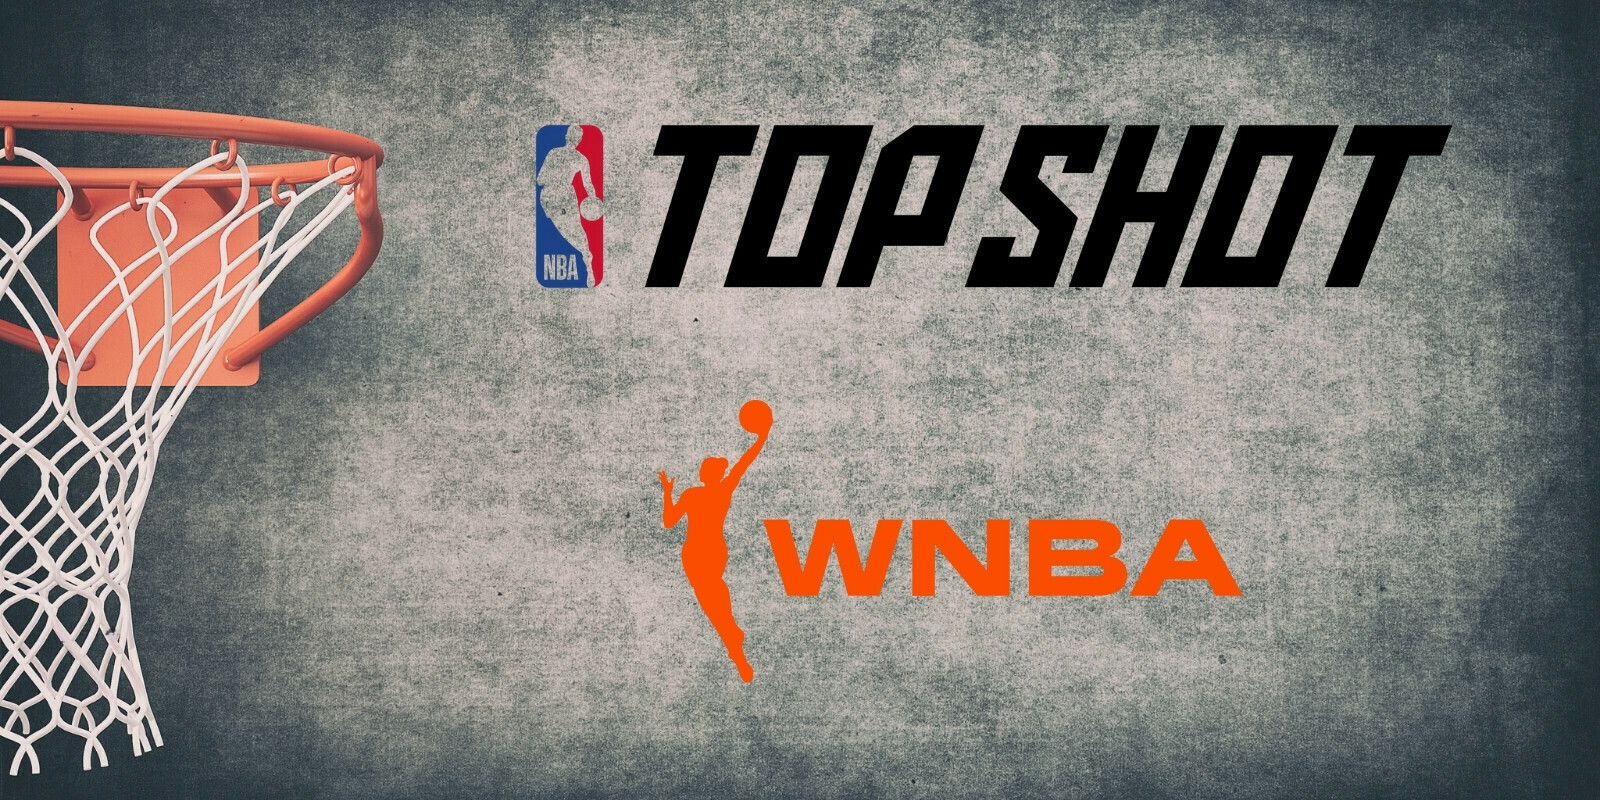 NBA Top Shot de Dapper Labs lance des NFTs basés sur les moments de la ligue féminine de basket-ball (WNBA)